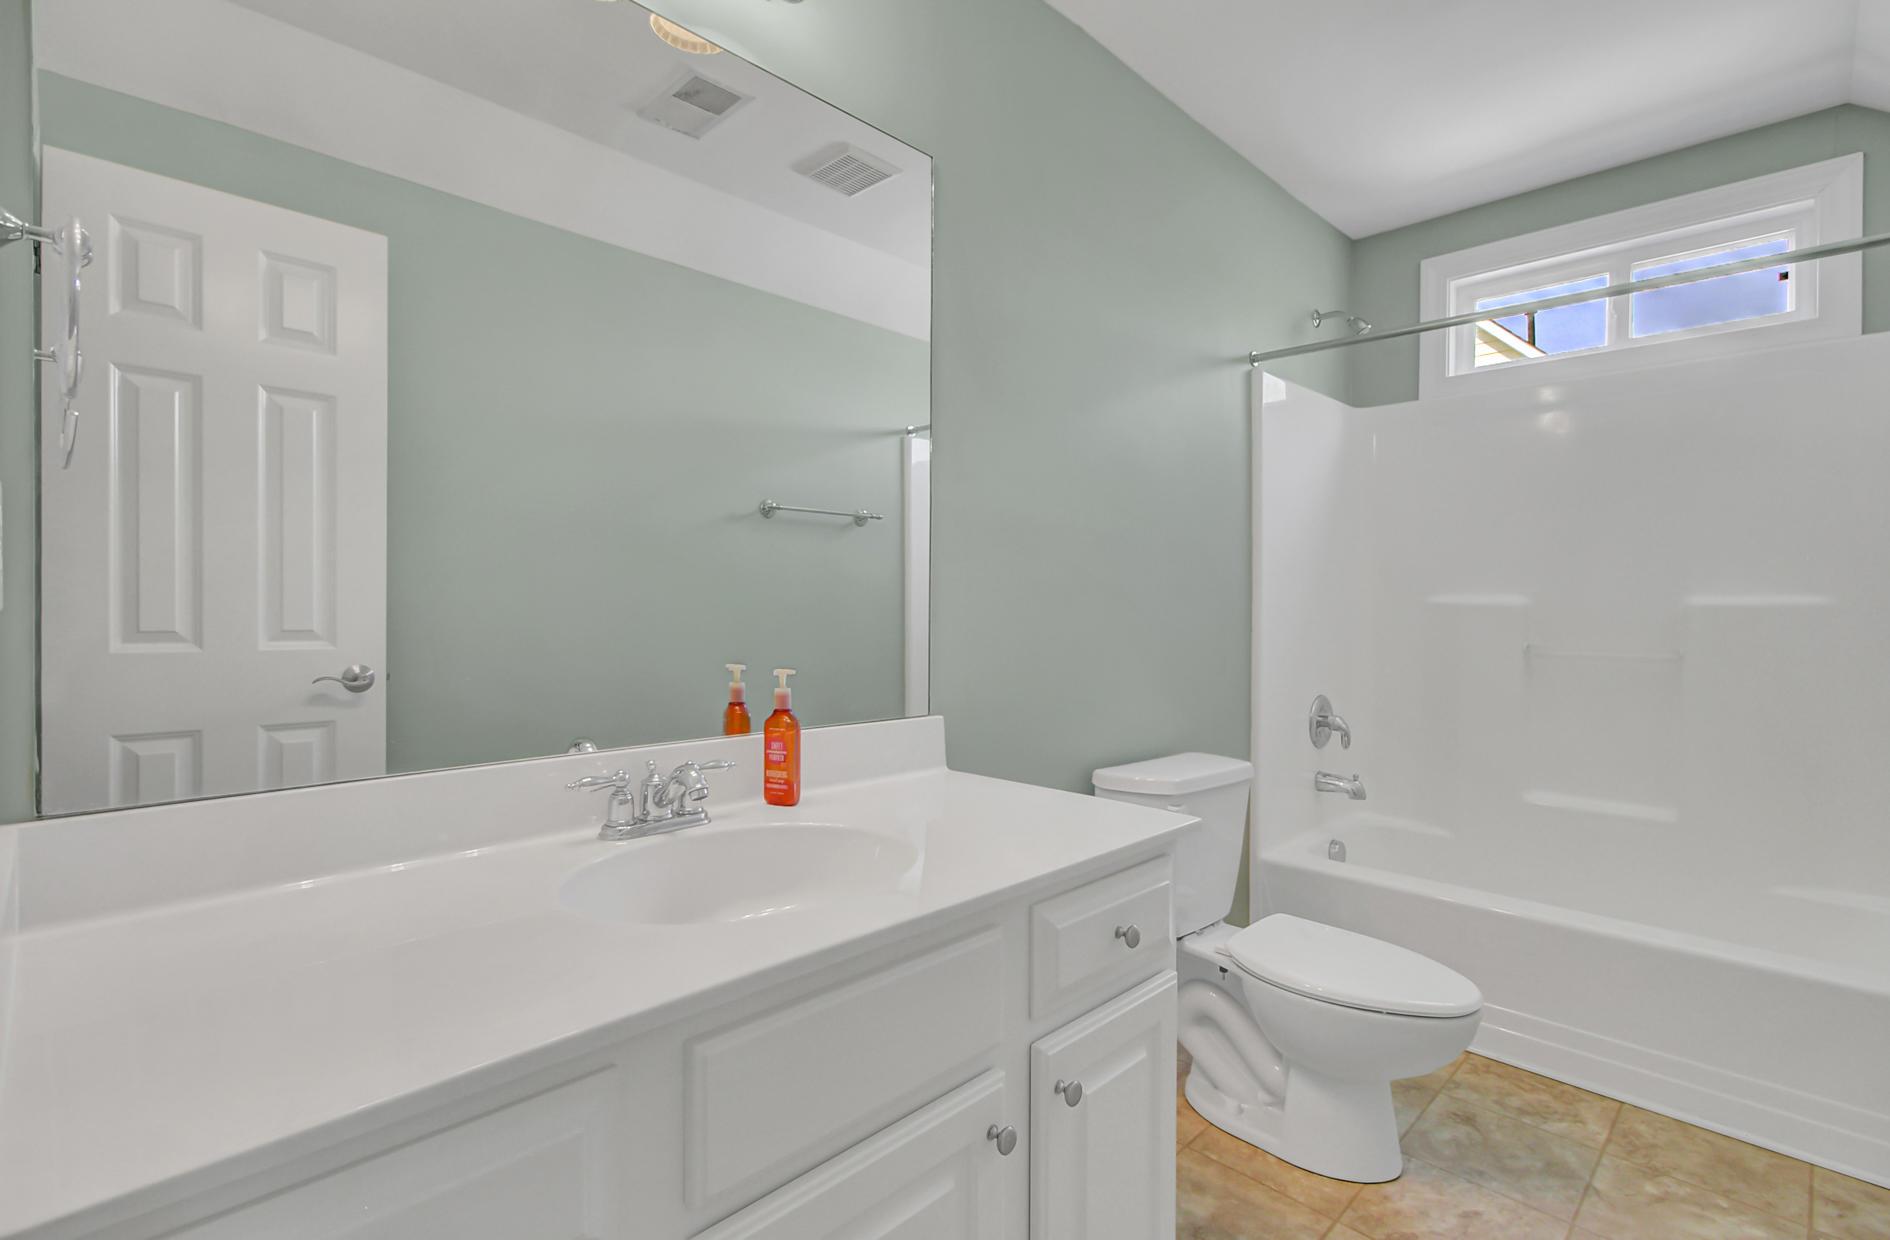 Marsh Cove Homes For Sale - 2928 Riverwood, Mount Pleasant, SC - 7